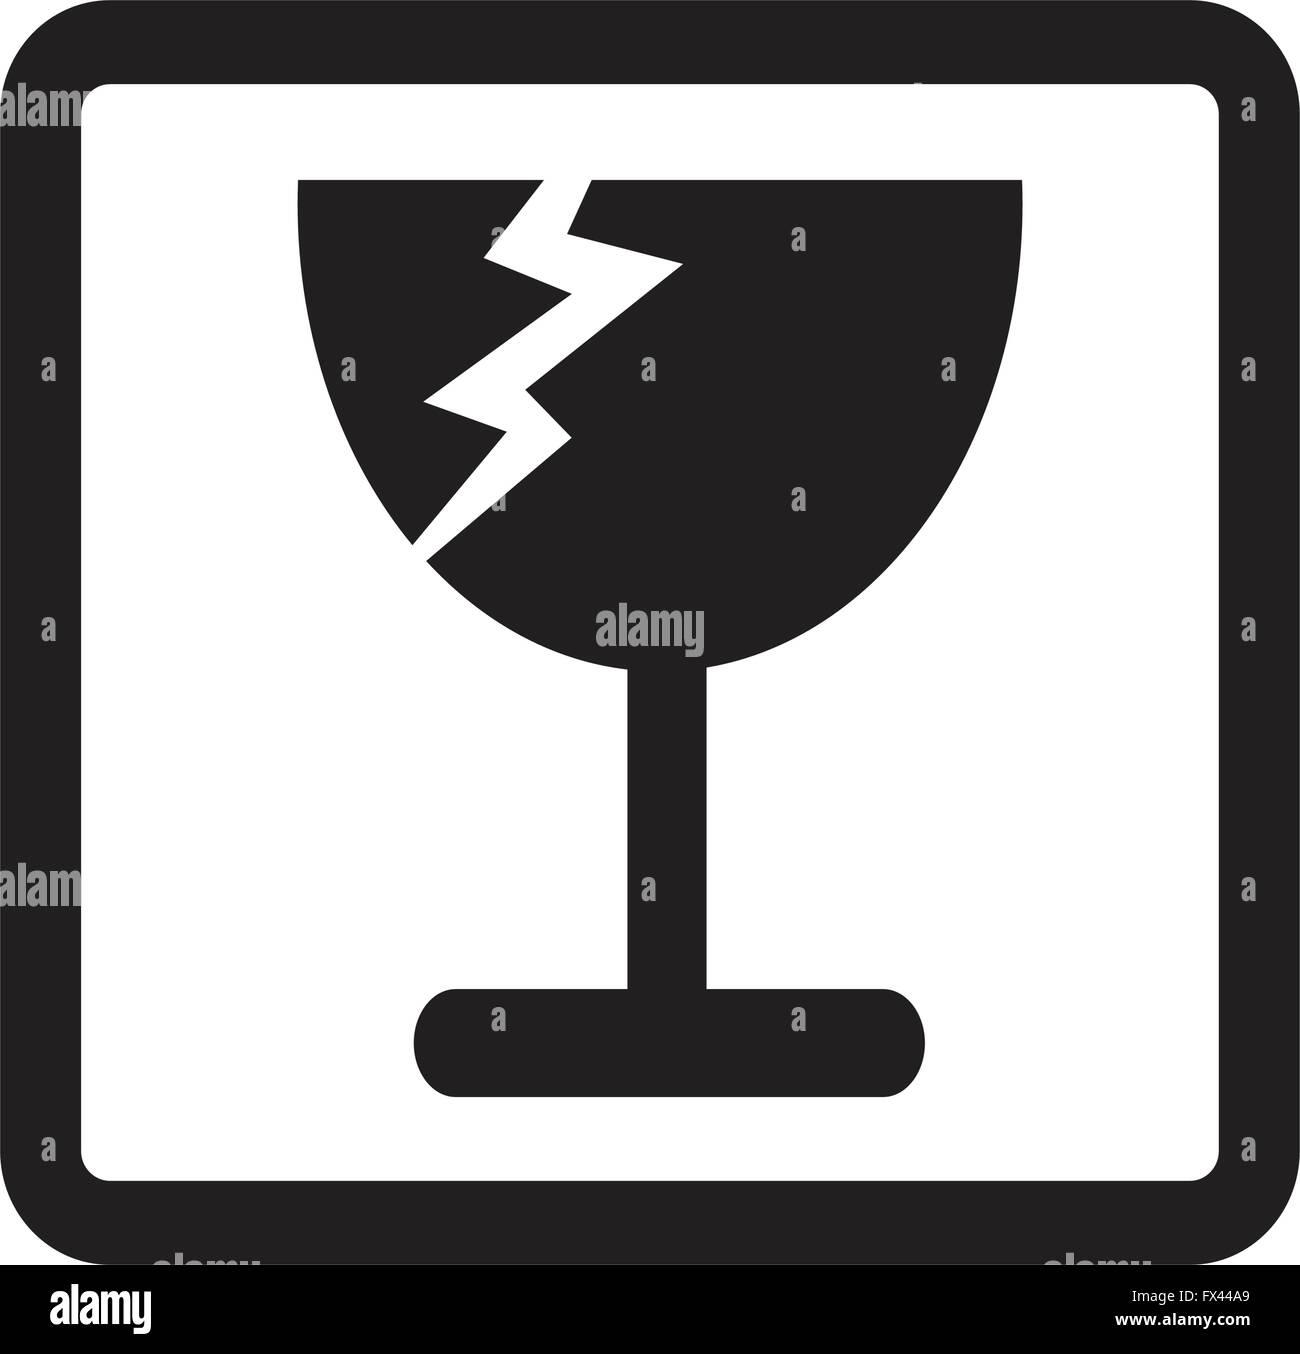 fragile icon symbol Illustration design Stock Vector Art ...